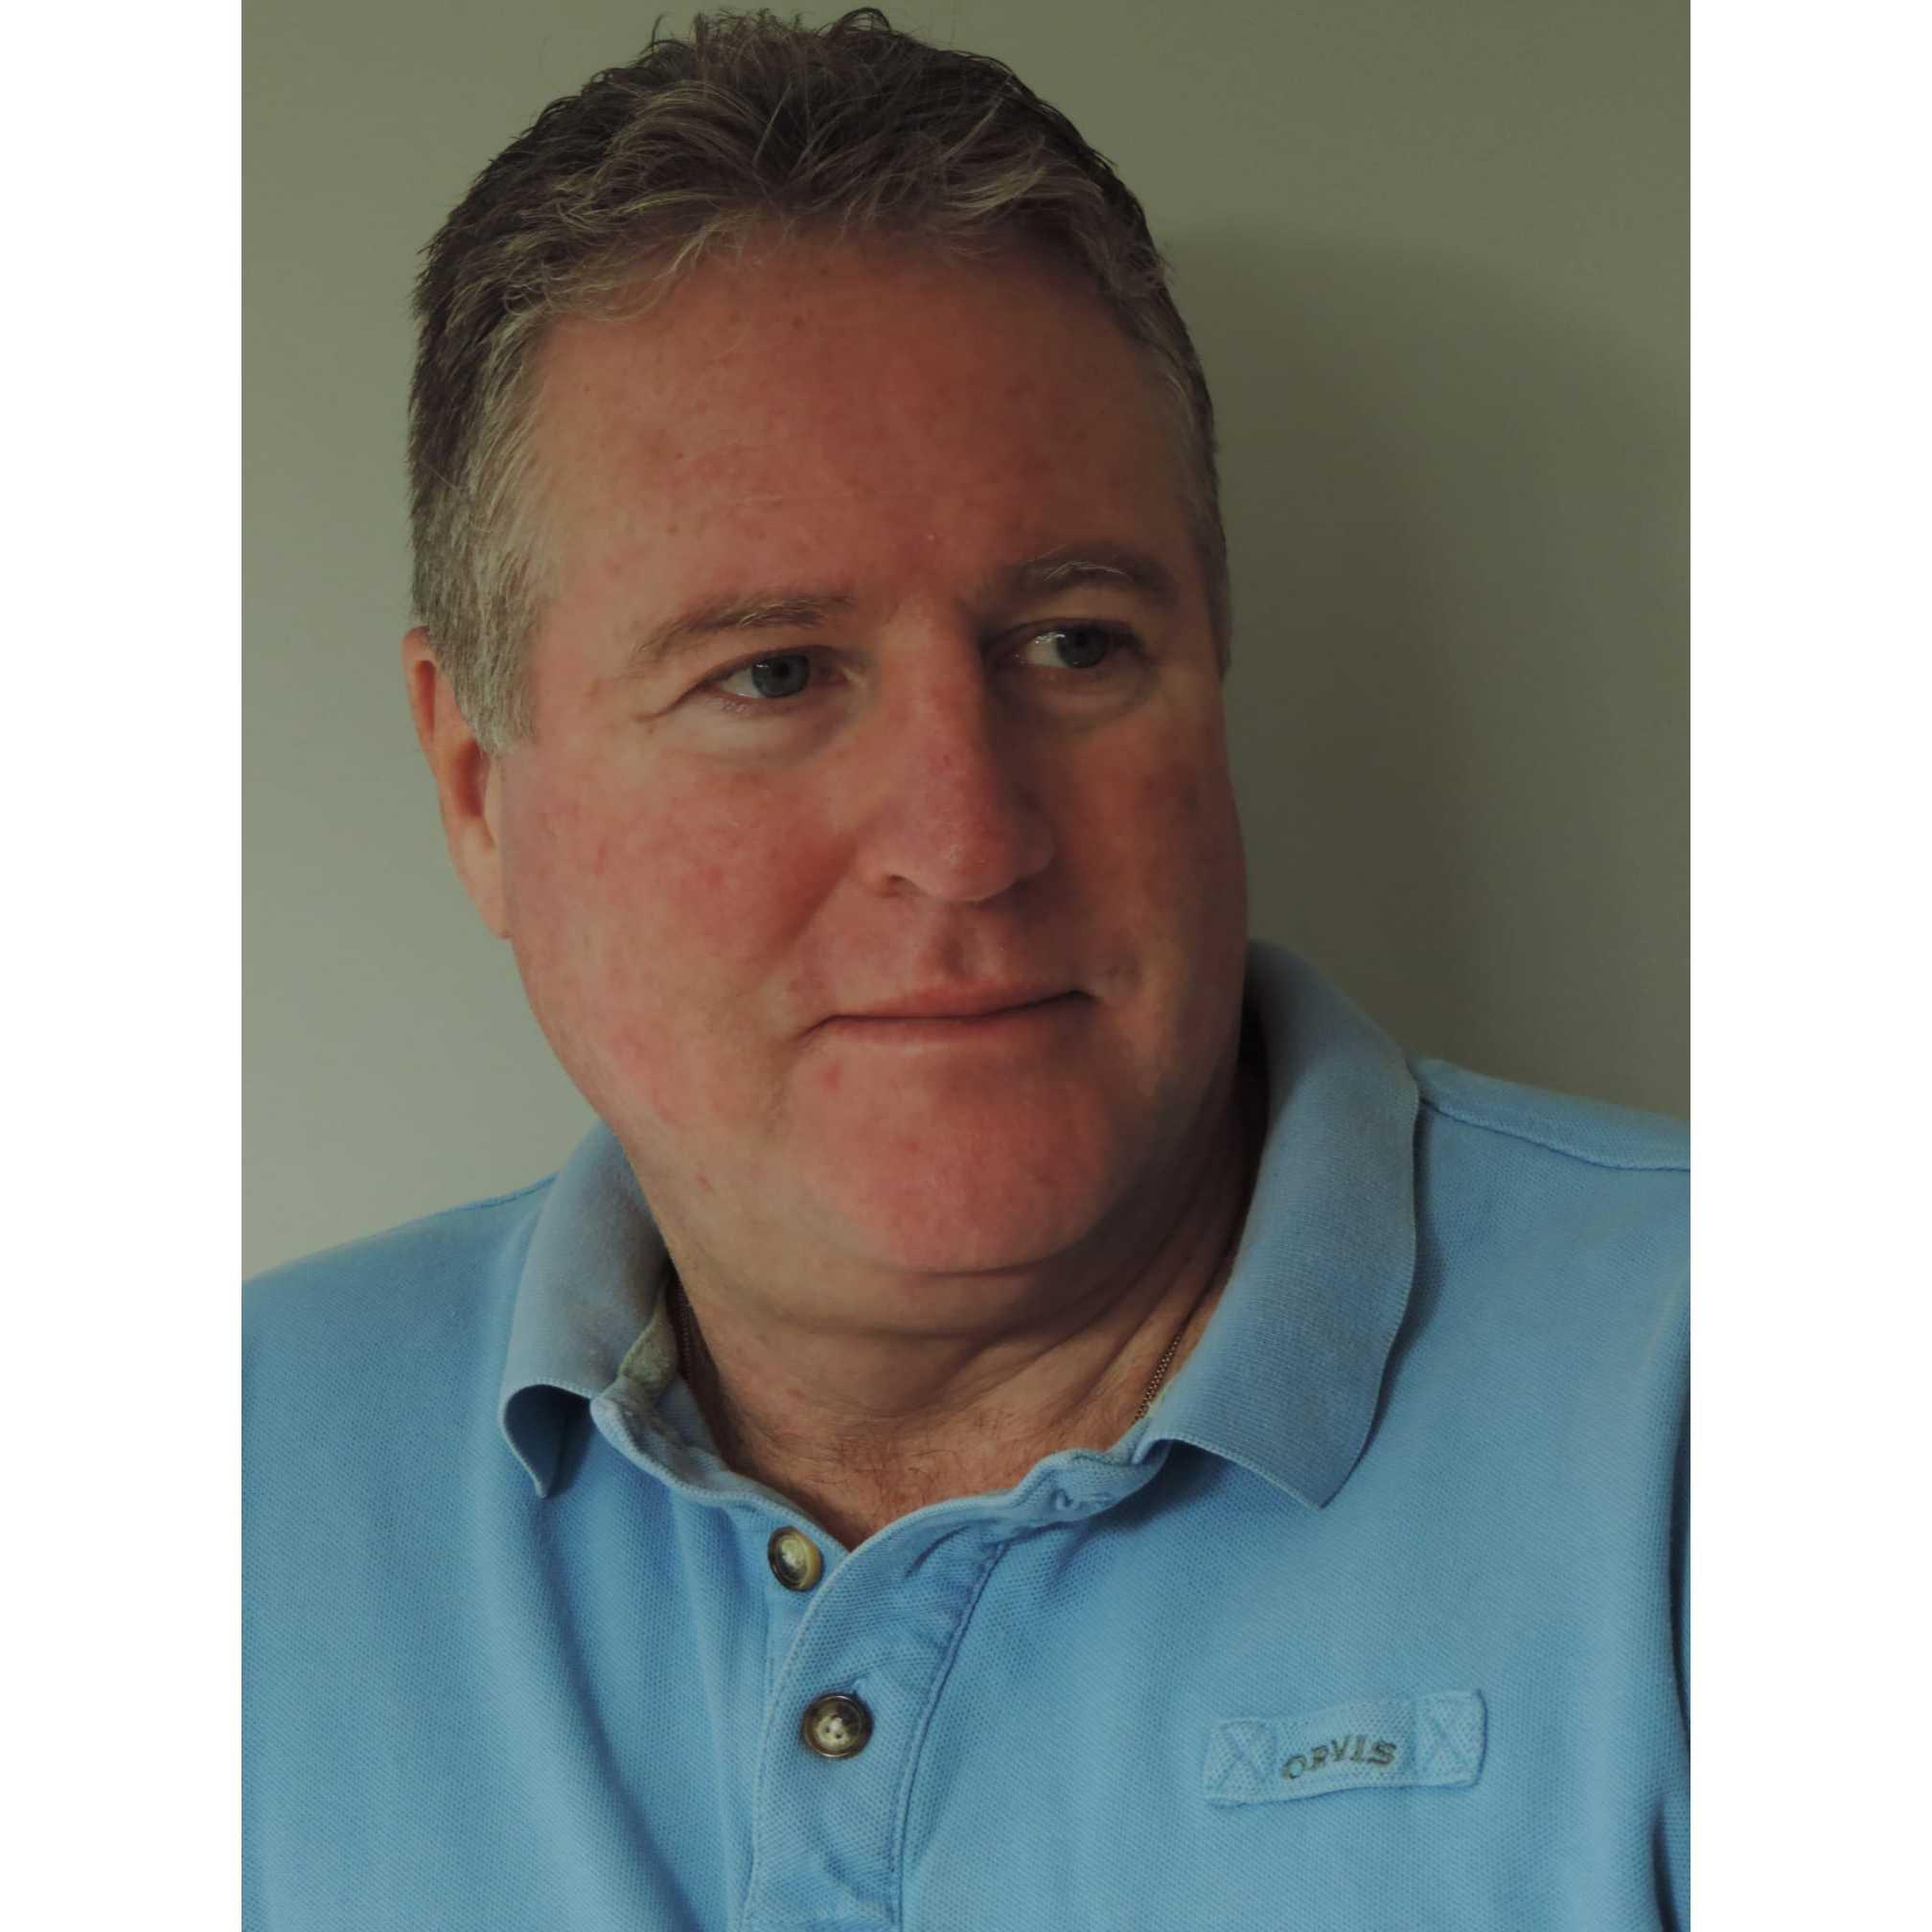 Mr.Joe Marais Frcs(Orl) - Harrow, London HA1 3RX - 020 8872 3838 | ShowMeLocal.com